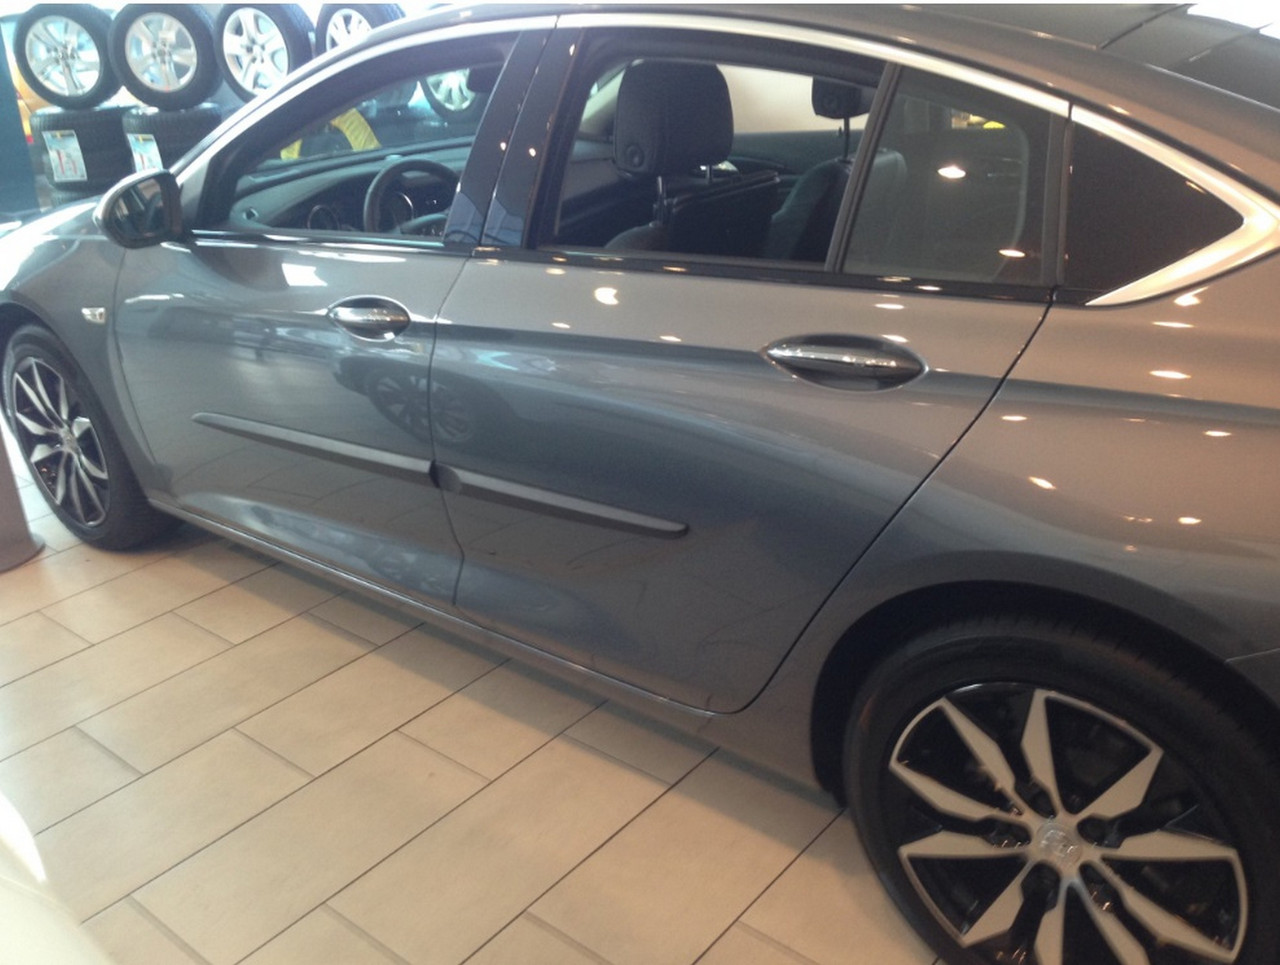 z-14 Opel Insignia 2017+ pu door mouldings